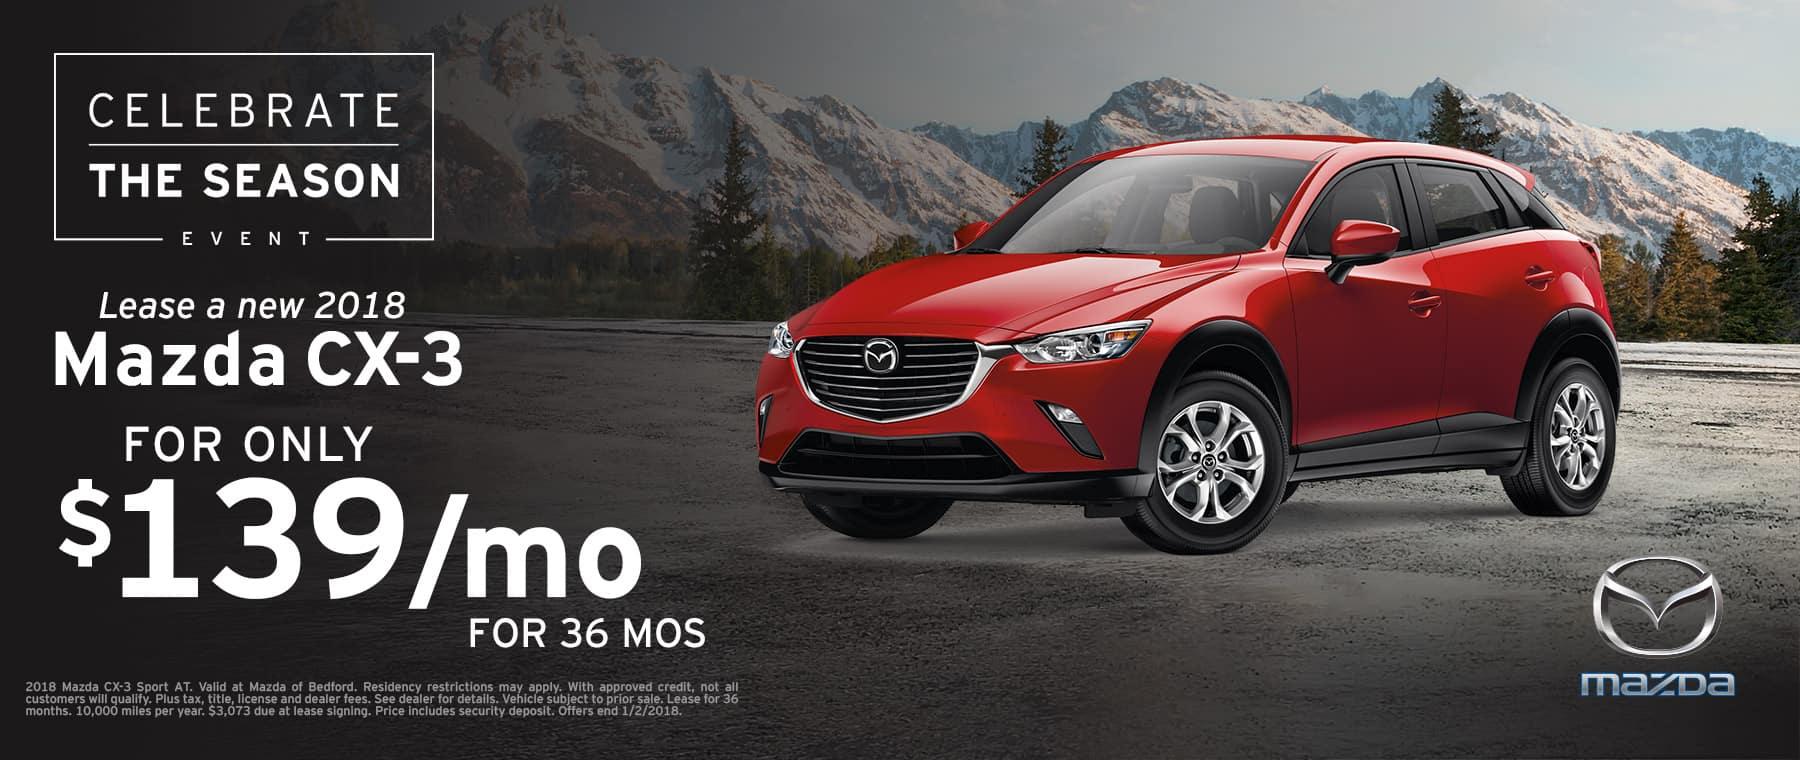 2018 Mazda CX-3 Lease Offer